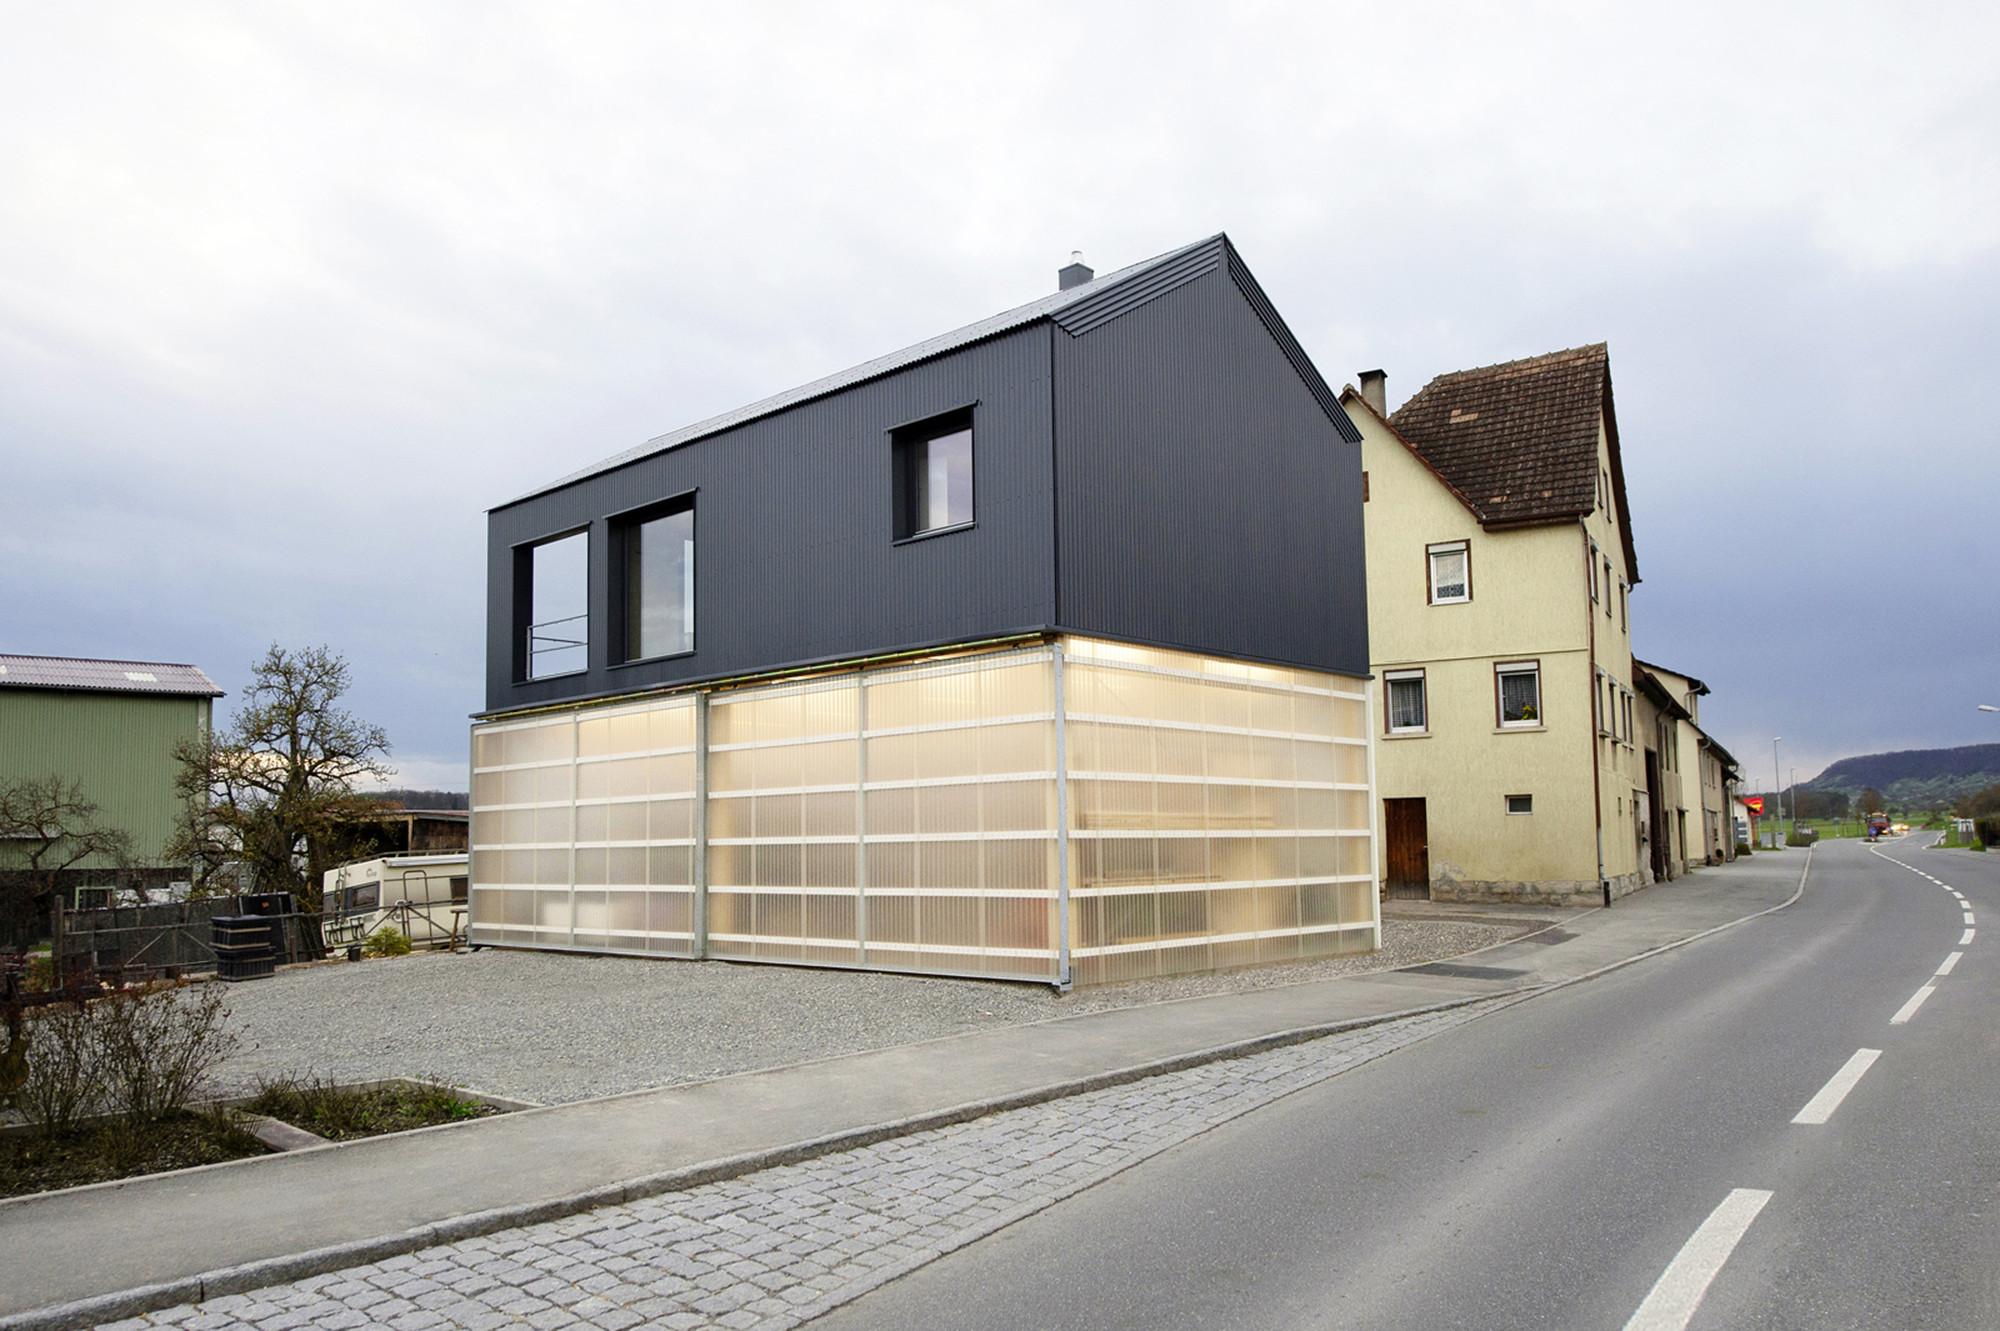 Gallery of house unimog fabian evers architecture wezel for Architektur 4 1